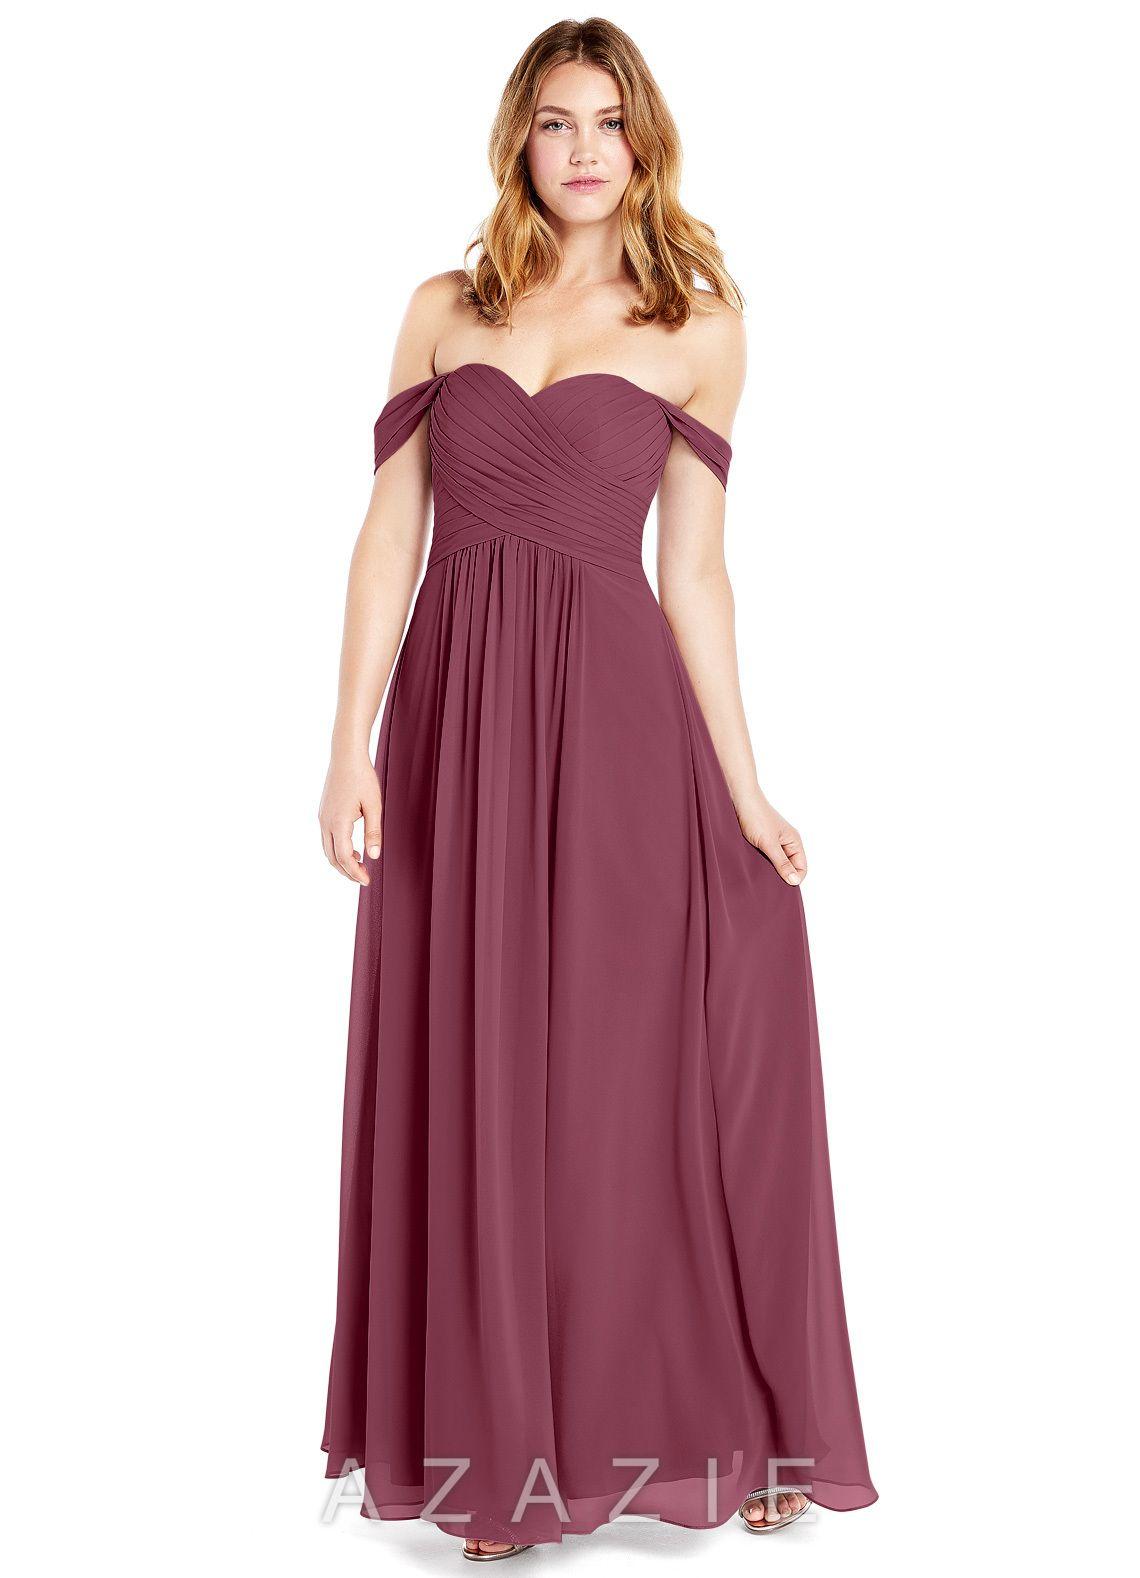 0c835c947a6 Azazie Corin Bridesmaid Dress - Dusty Rose